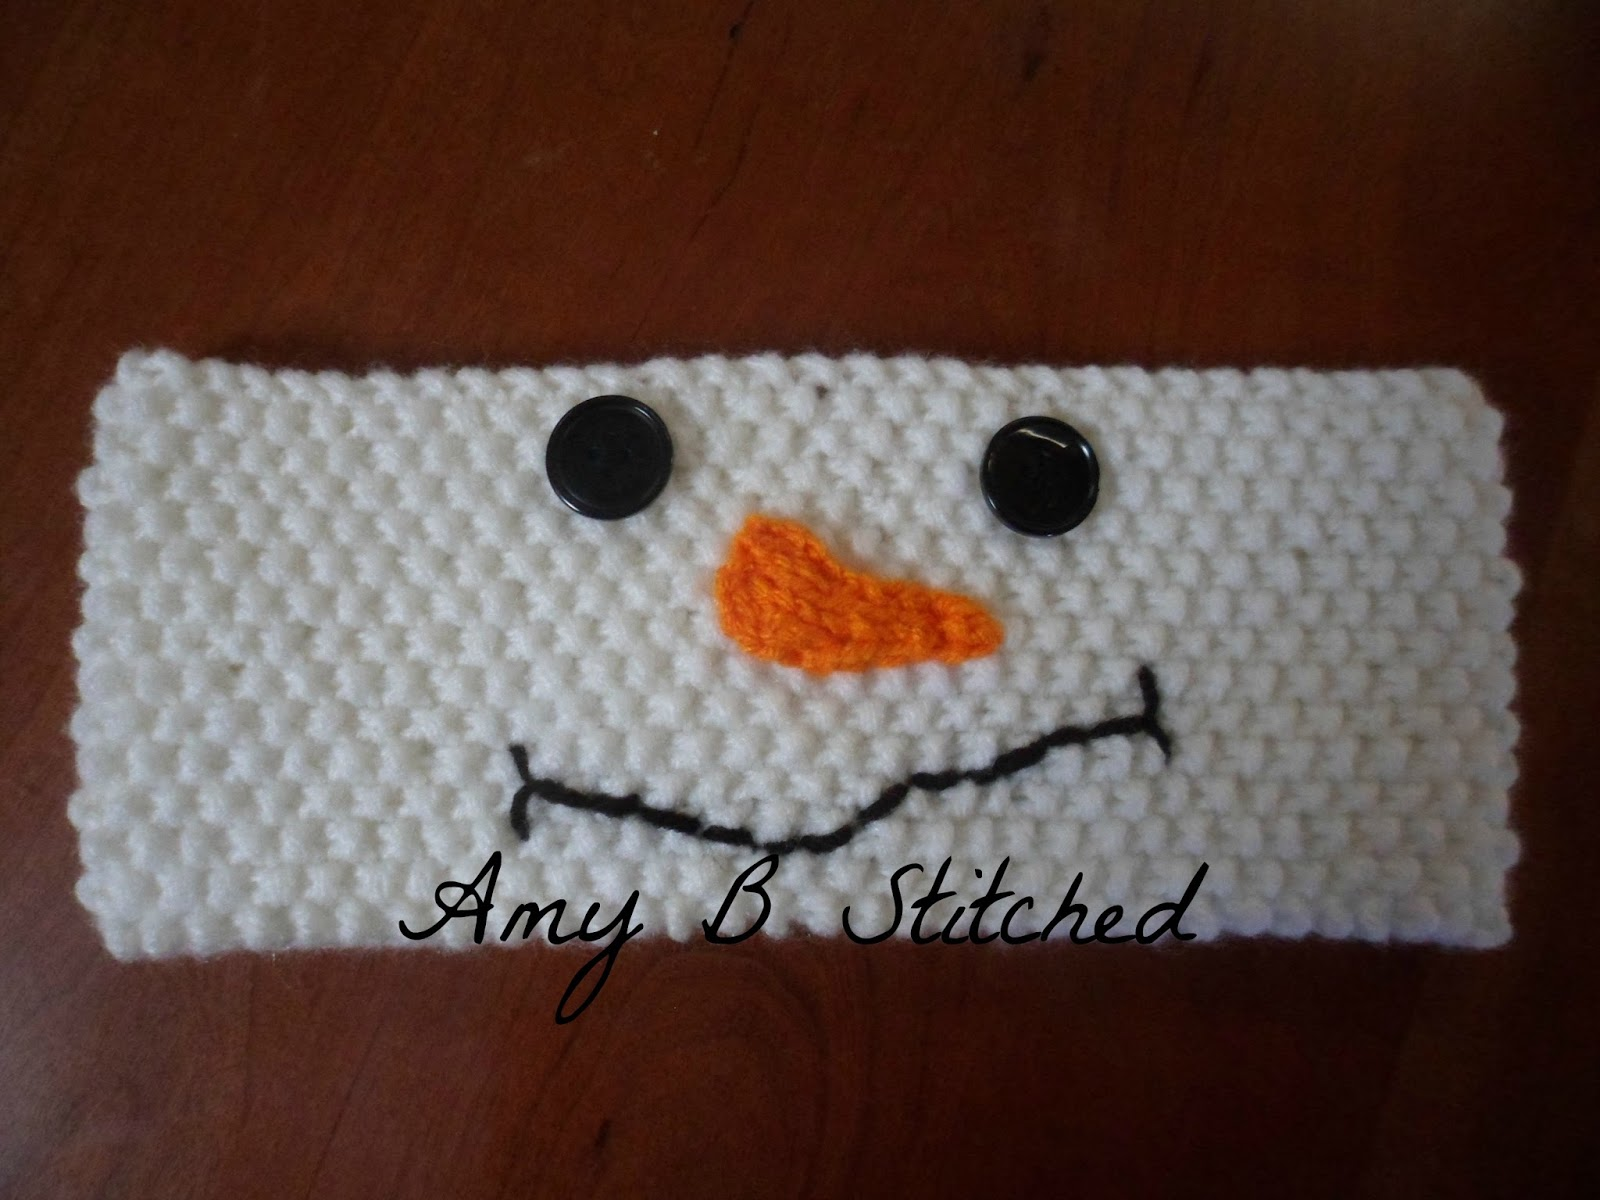 A Stitch At A Time for Amy B Stitched: Mr. Snowman Headband FREE ...